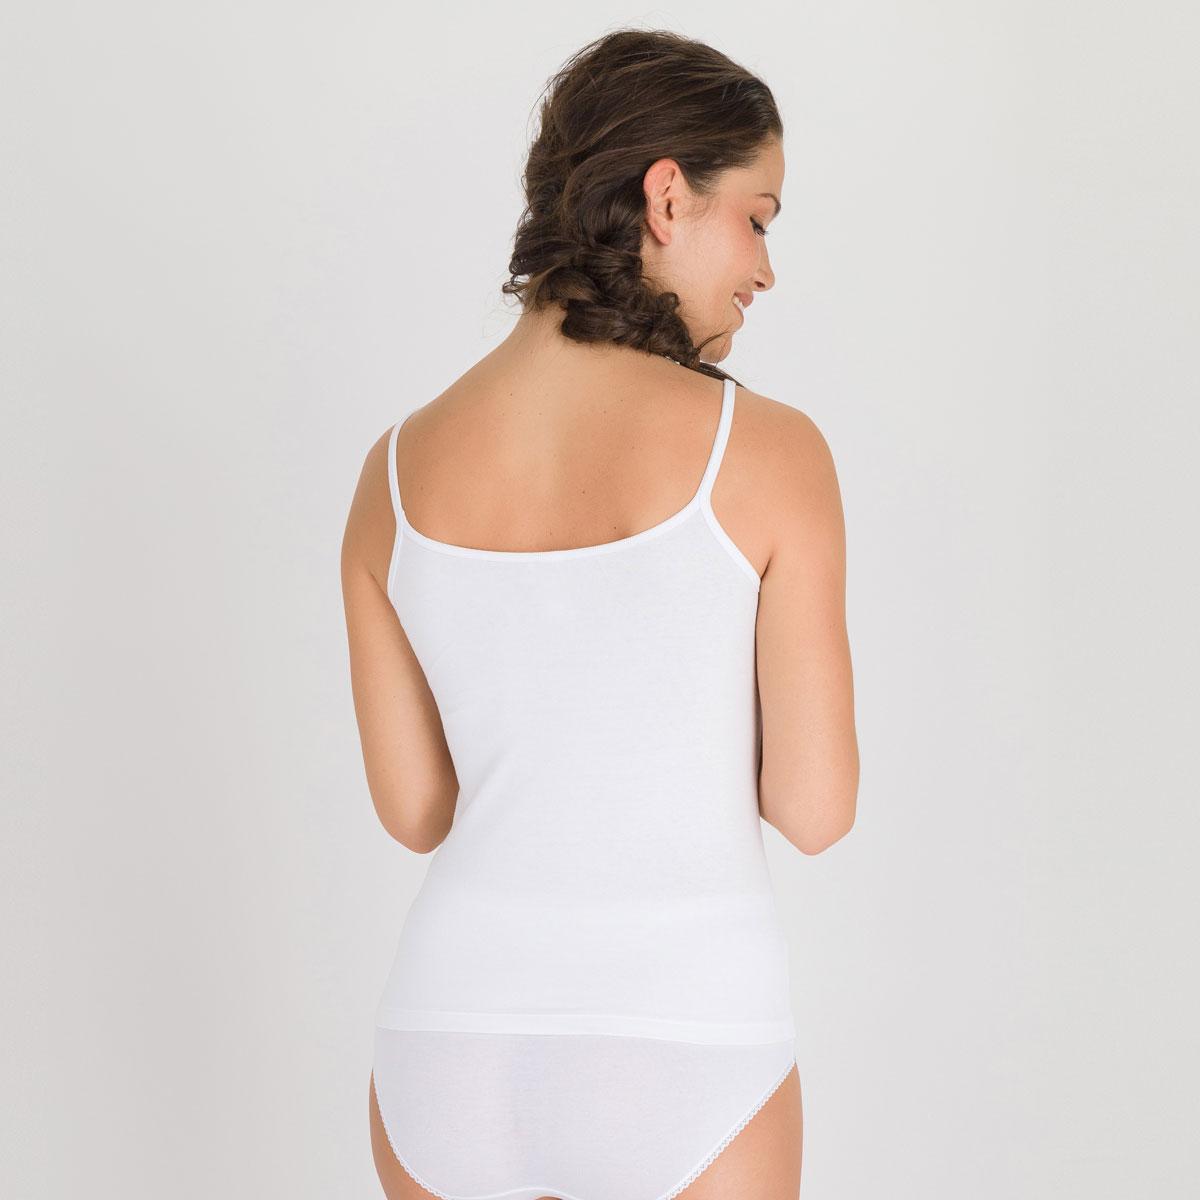 Caraco blanc - Cotton Liberty-PLAYTEX